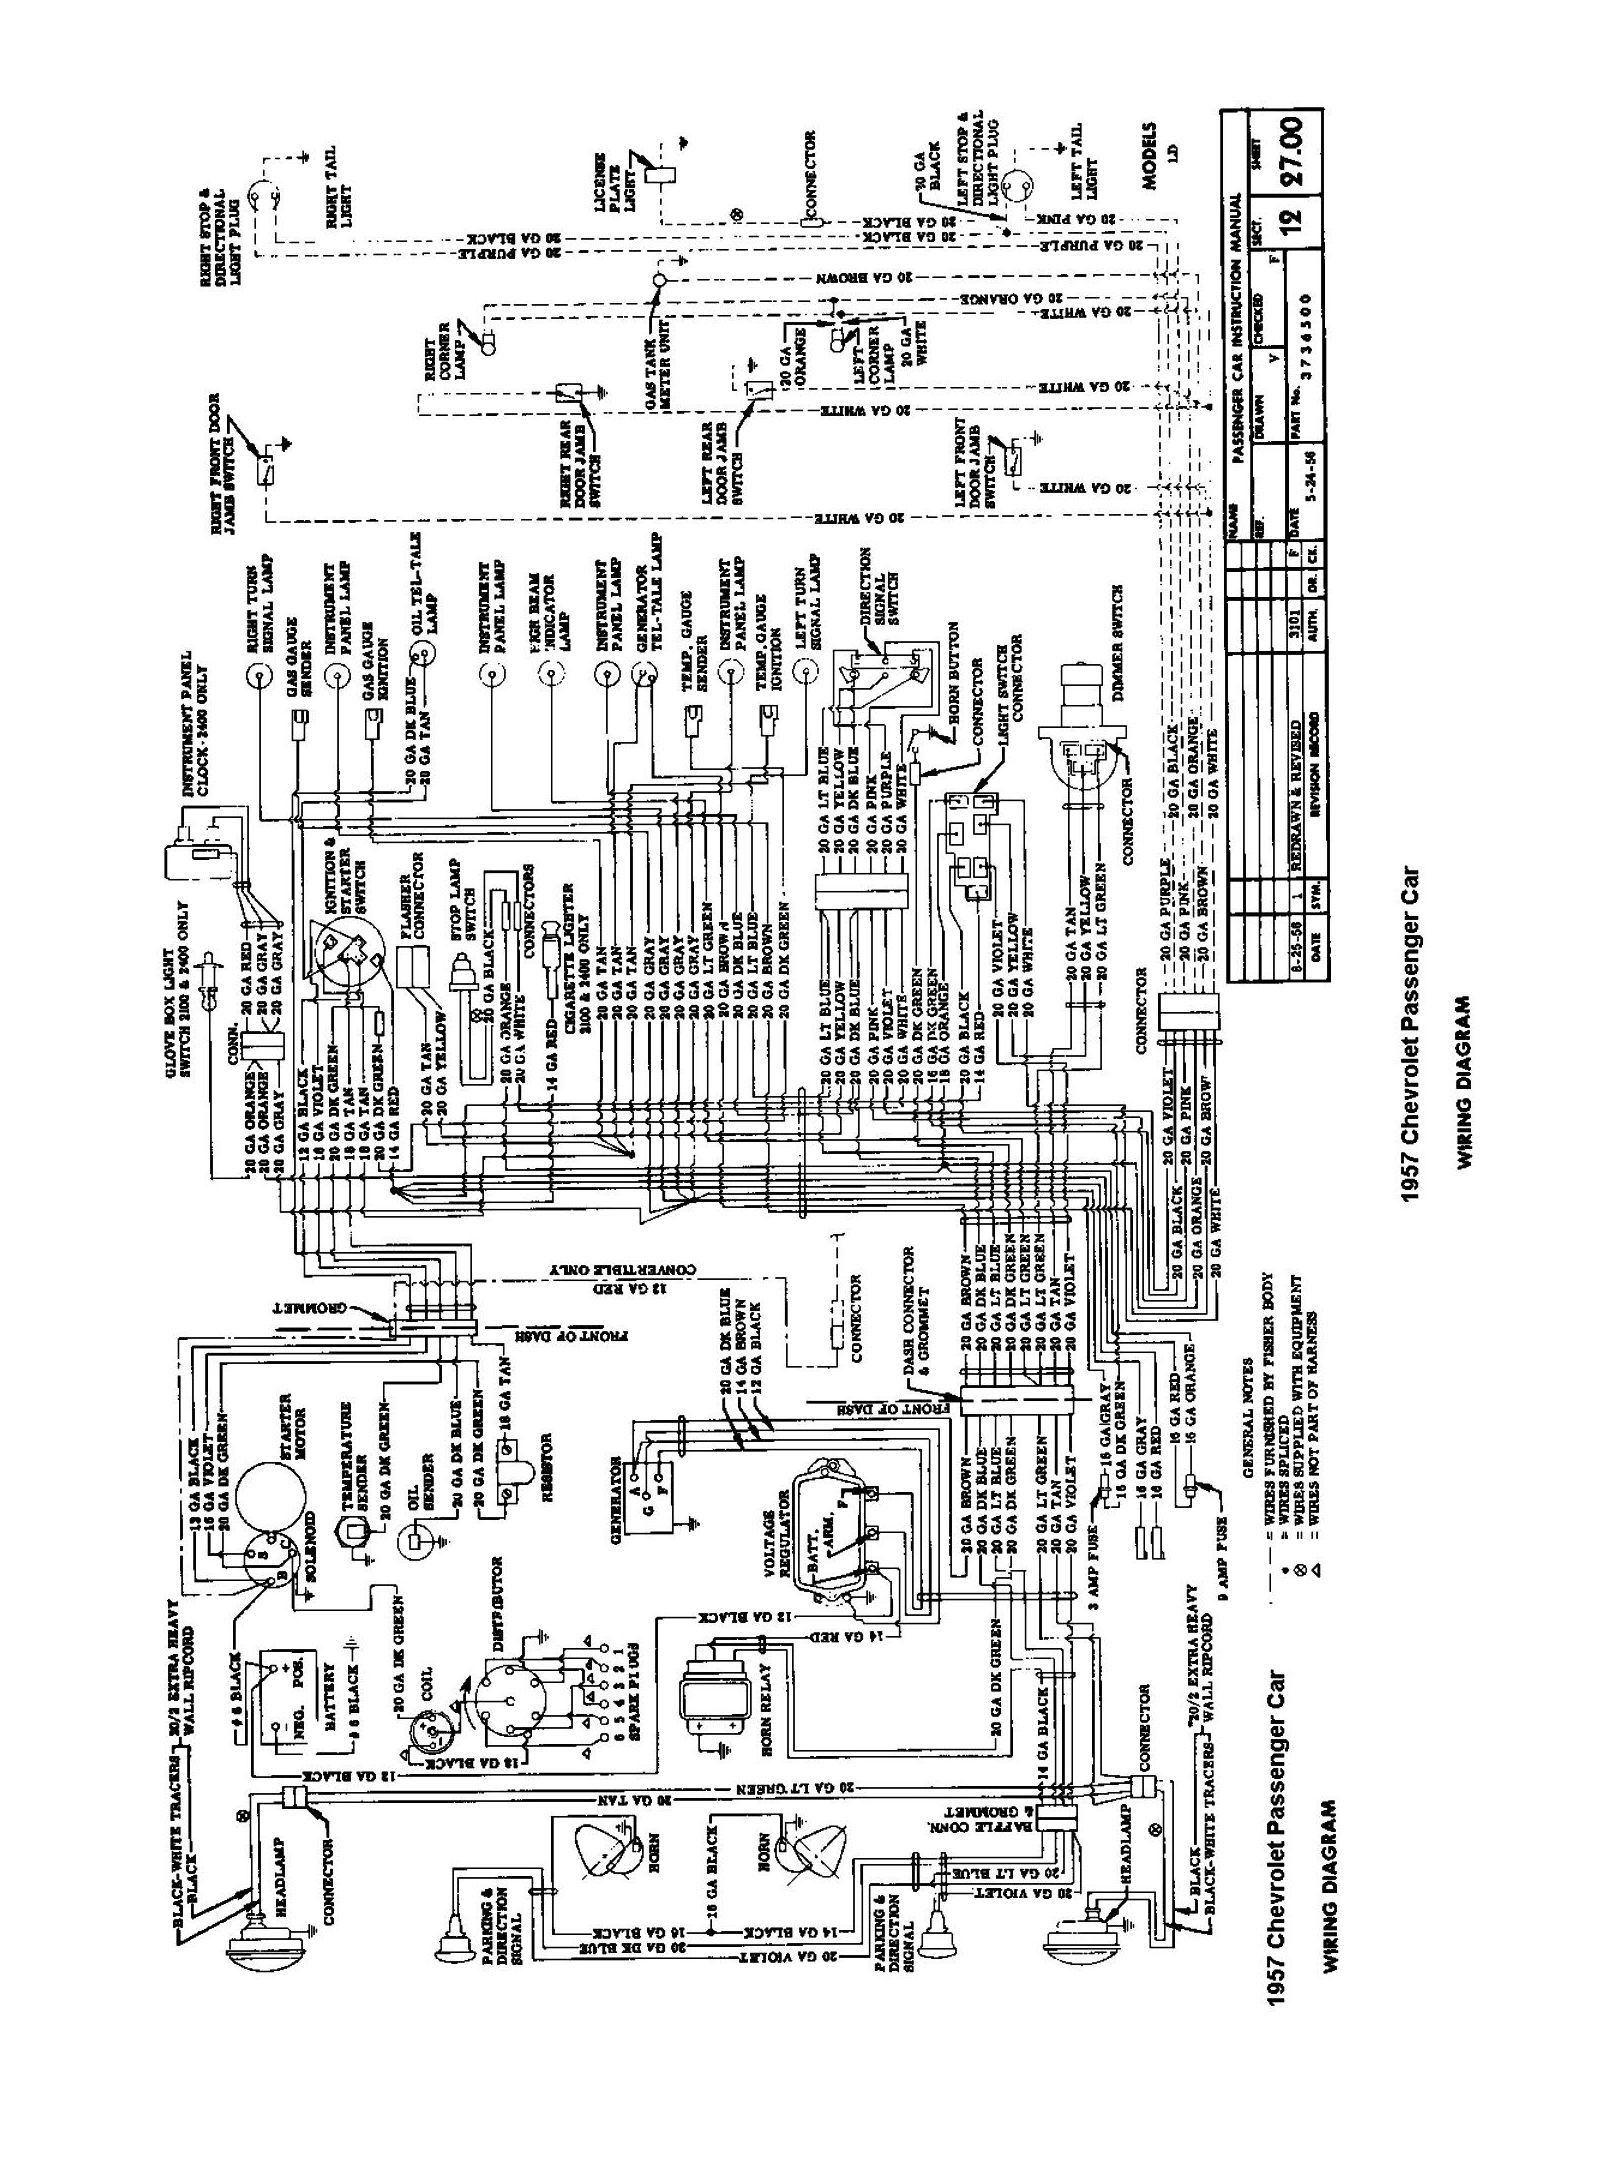 Lmu1230ma Manual In 2021 Wiring Diagram Diagram 1957 Chevrolet